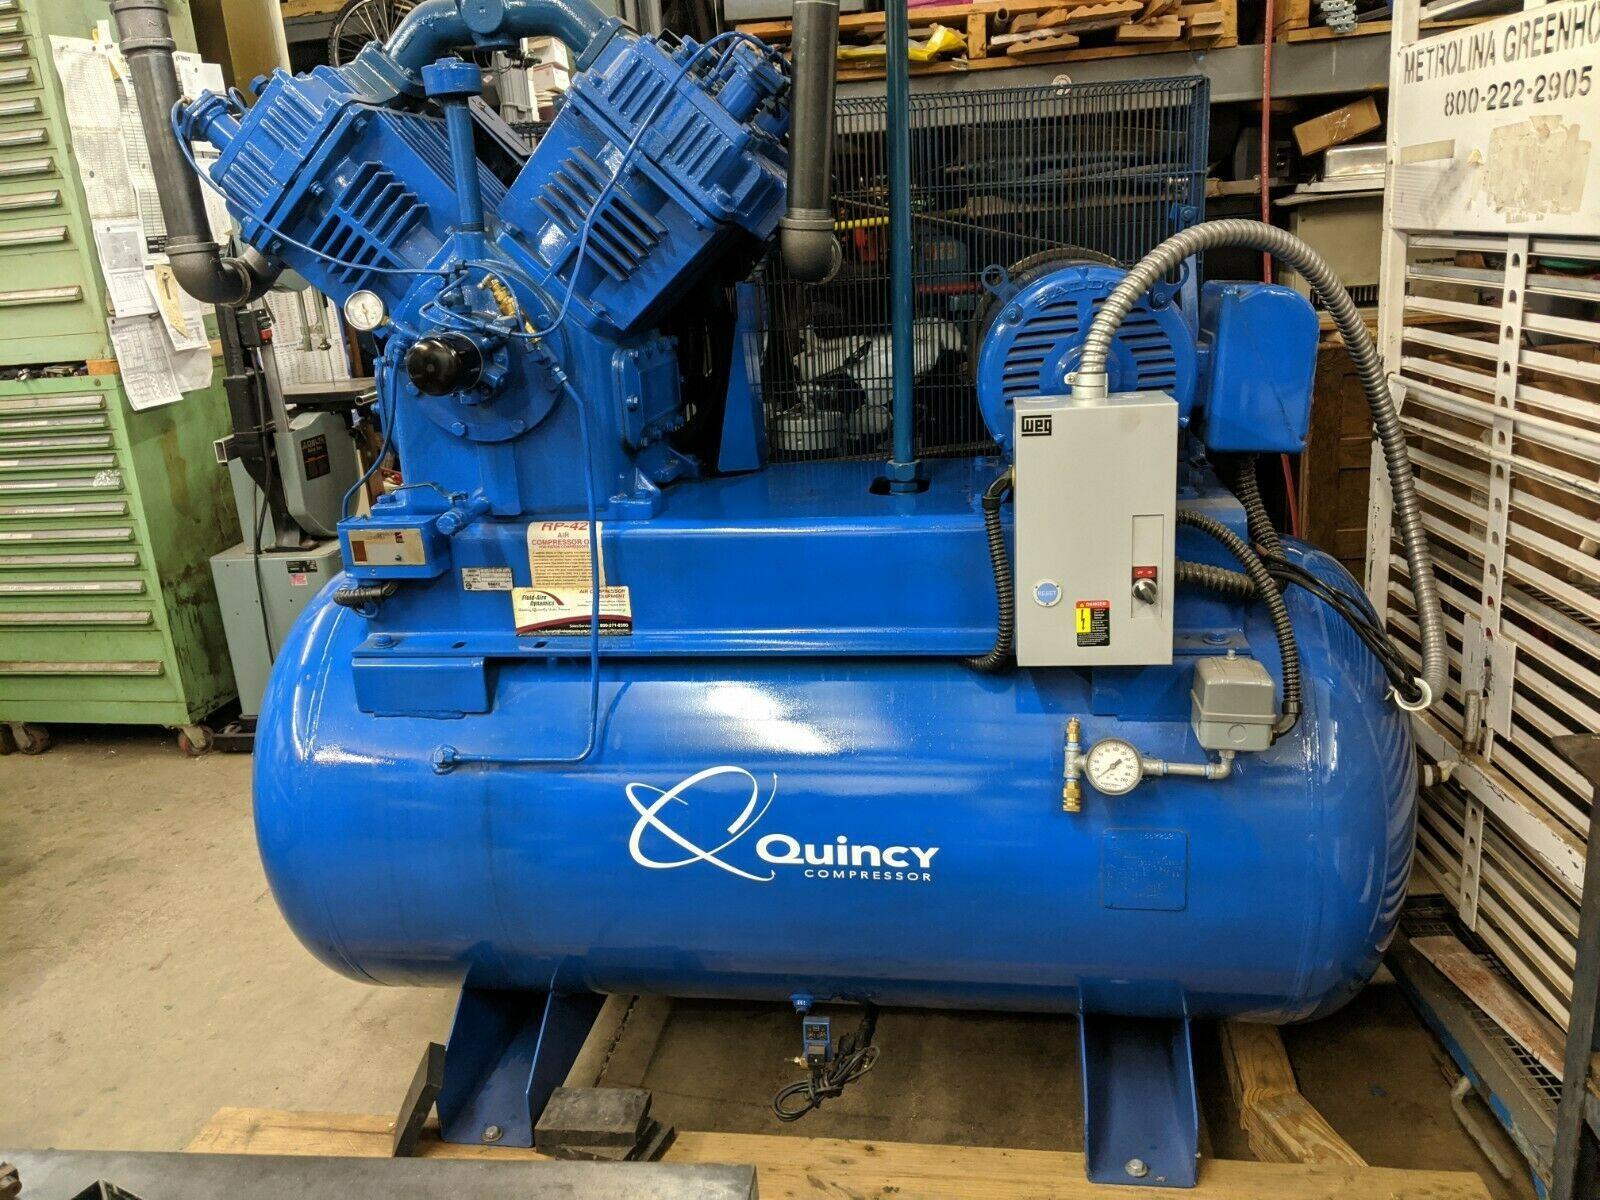 25 Hp Air Compressor in 2020 Compressor, Air compressor, Air